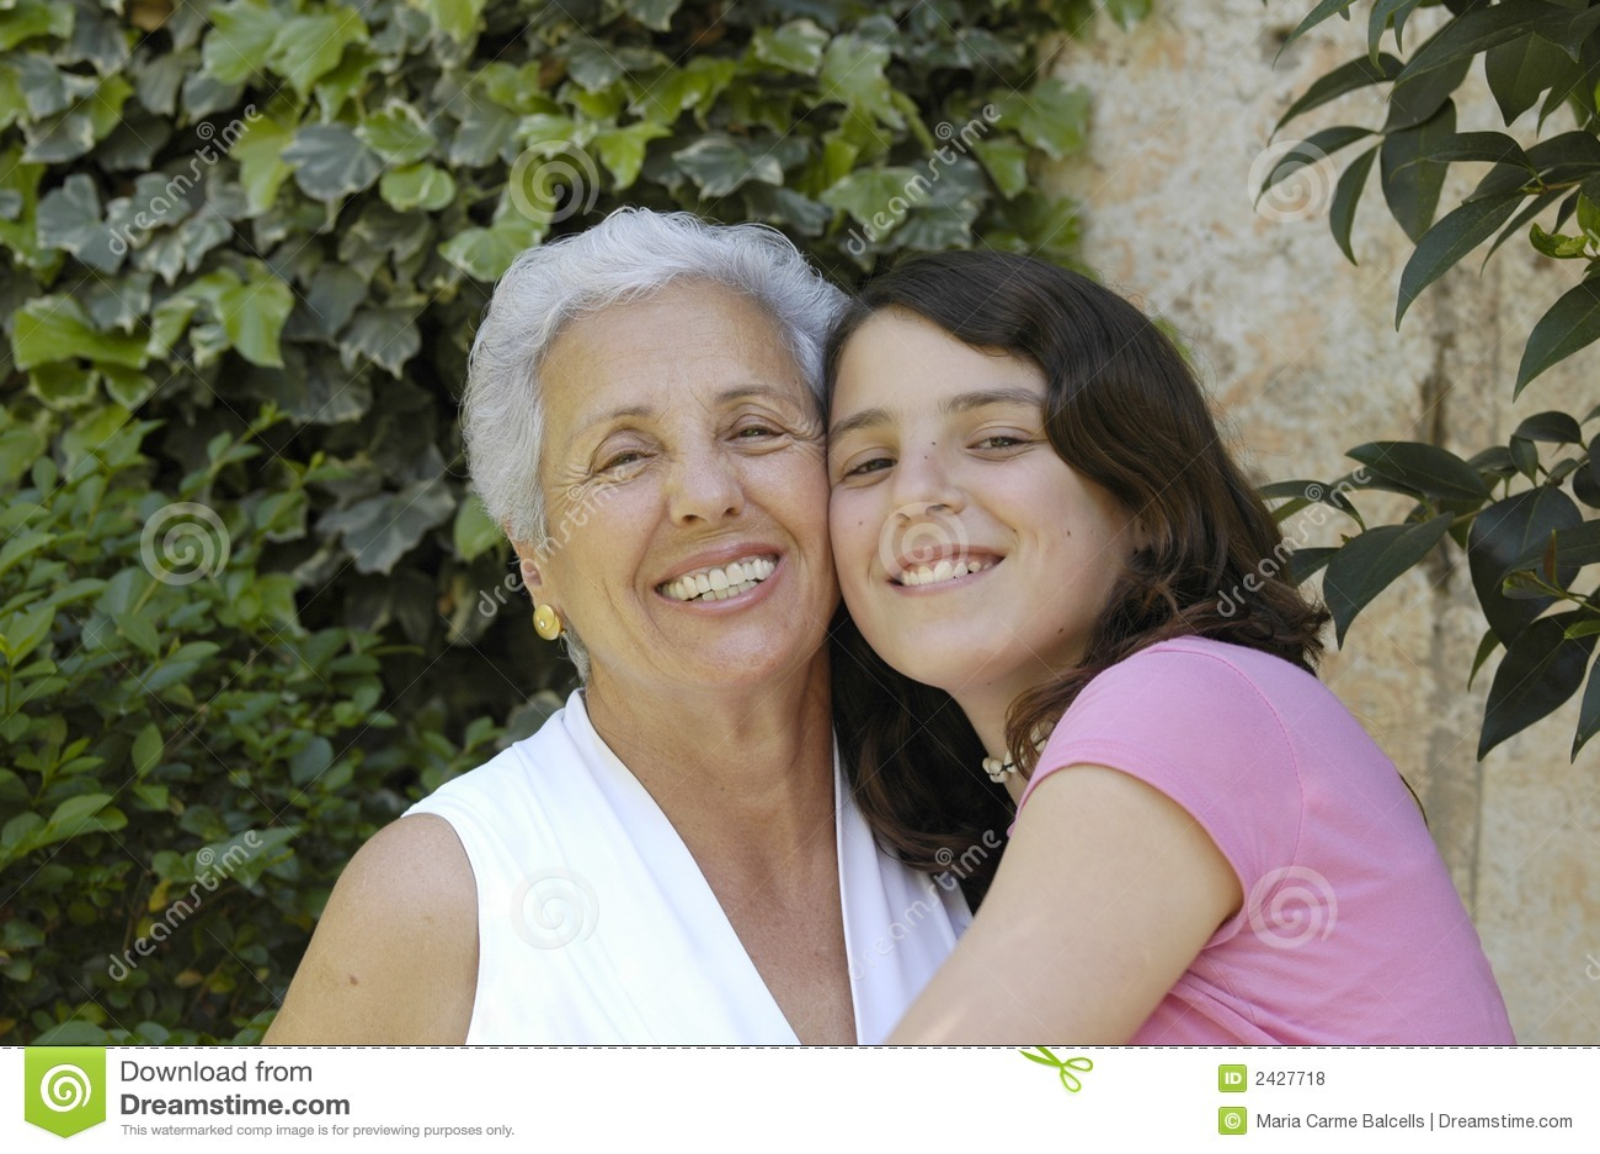 Grandma With Granddaughter Royalty Free Stock Photos - Image: 2427718